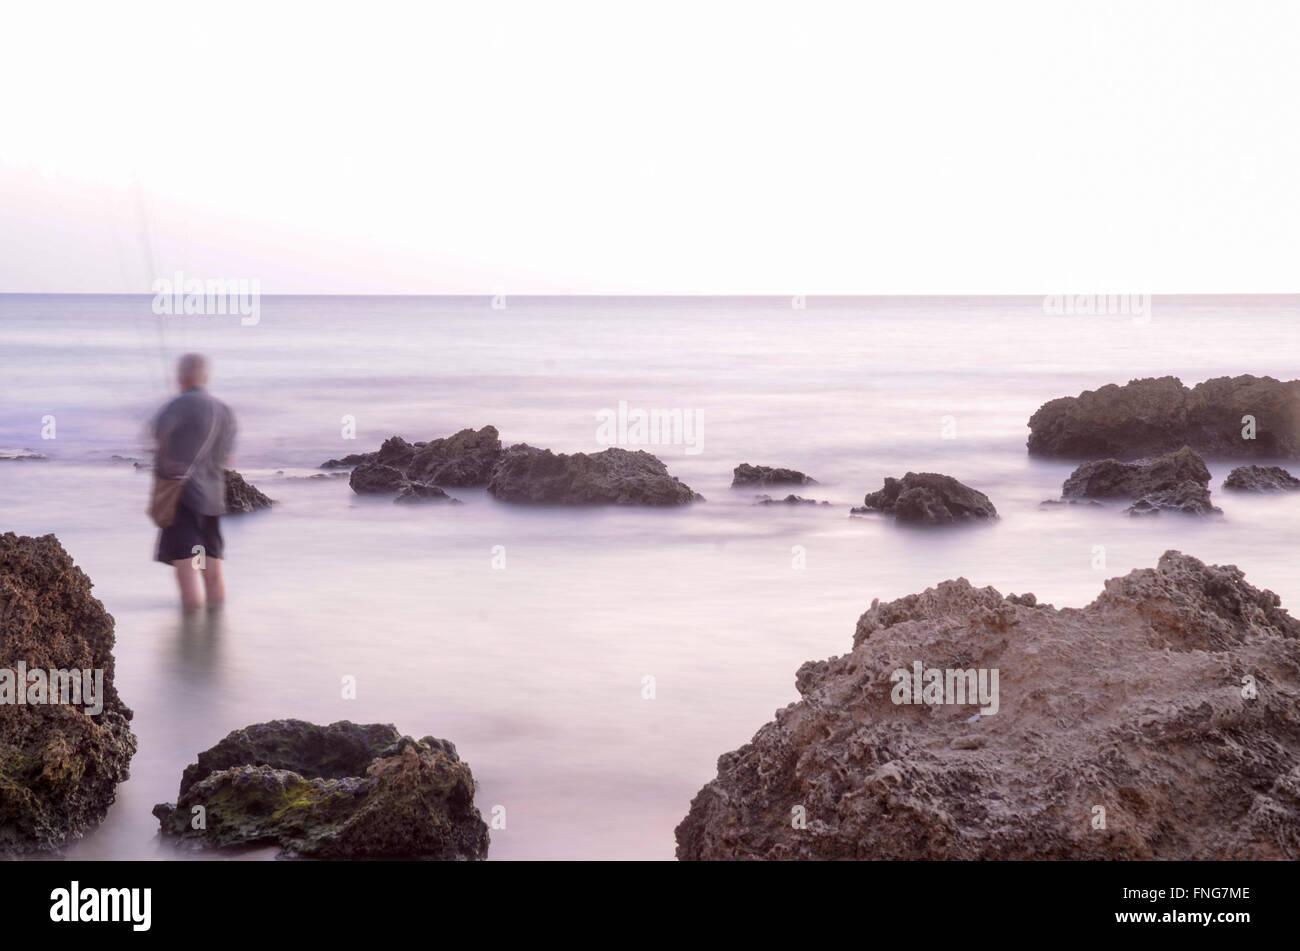 Lone Fisherman in the Mediterranean sea - Stock Image